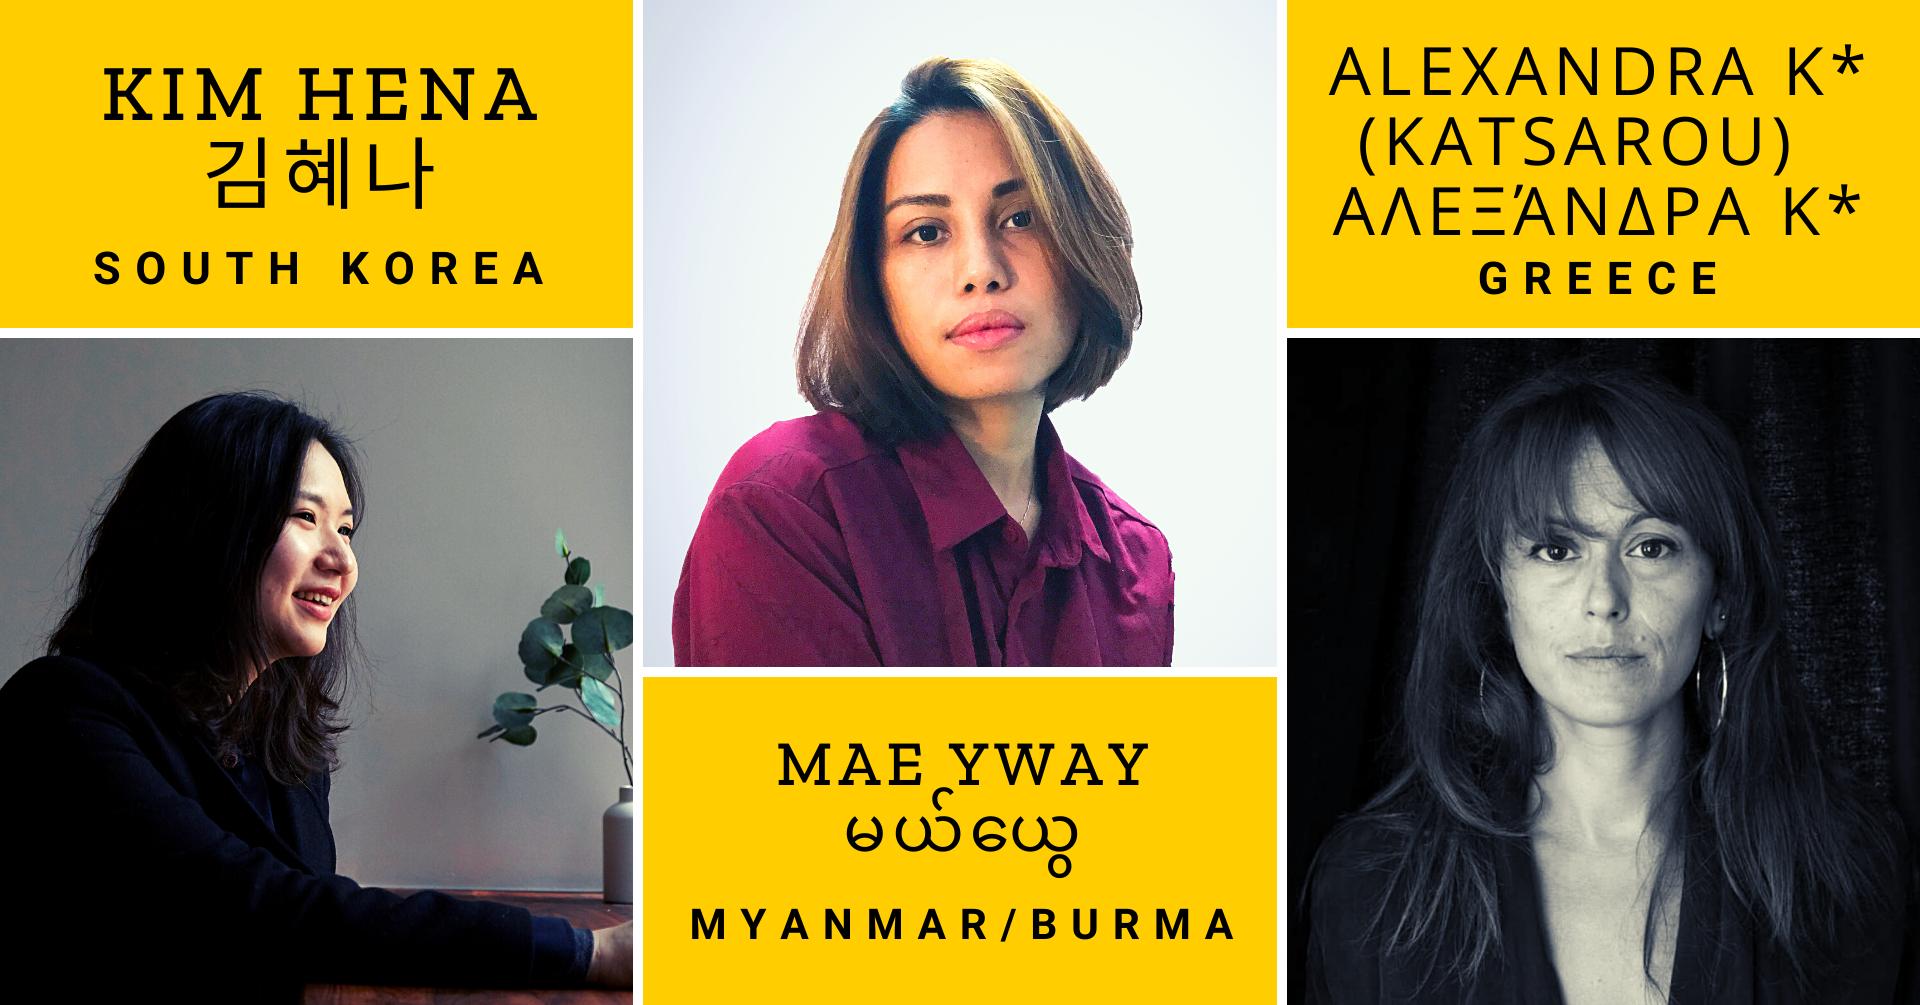 Headshots of three women with their name in English plus their name in original non-Roman script and country of origin under each: Kim Hena, South Korea; Mae Yway, Myanmar/Burma; Alexandra K* (Katsarou), Greece